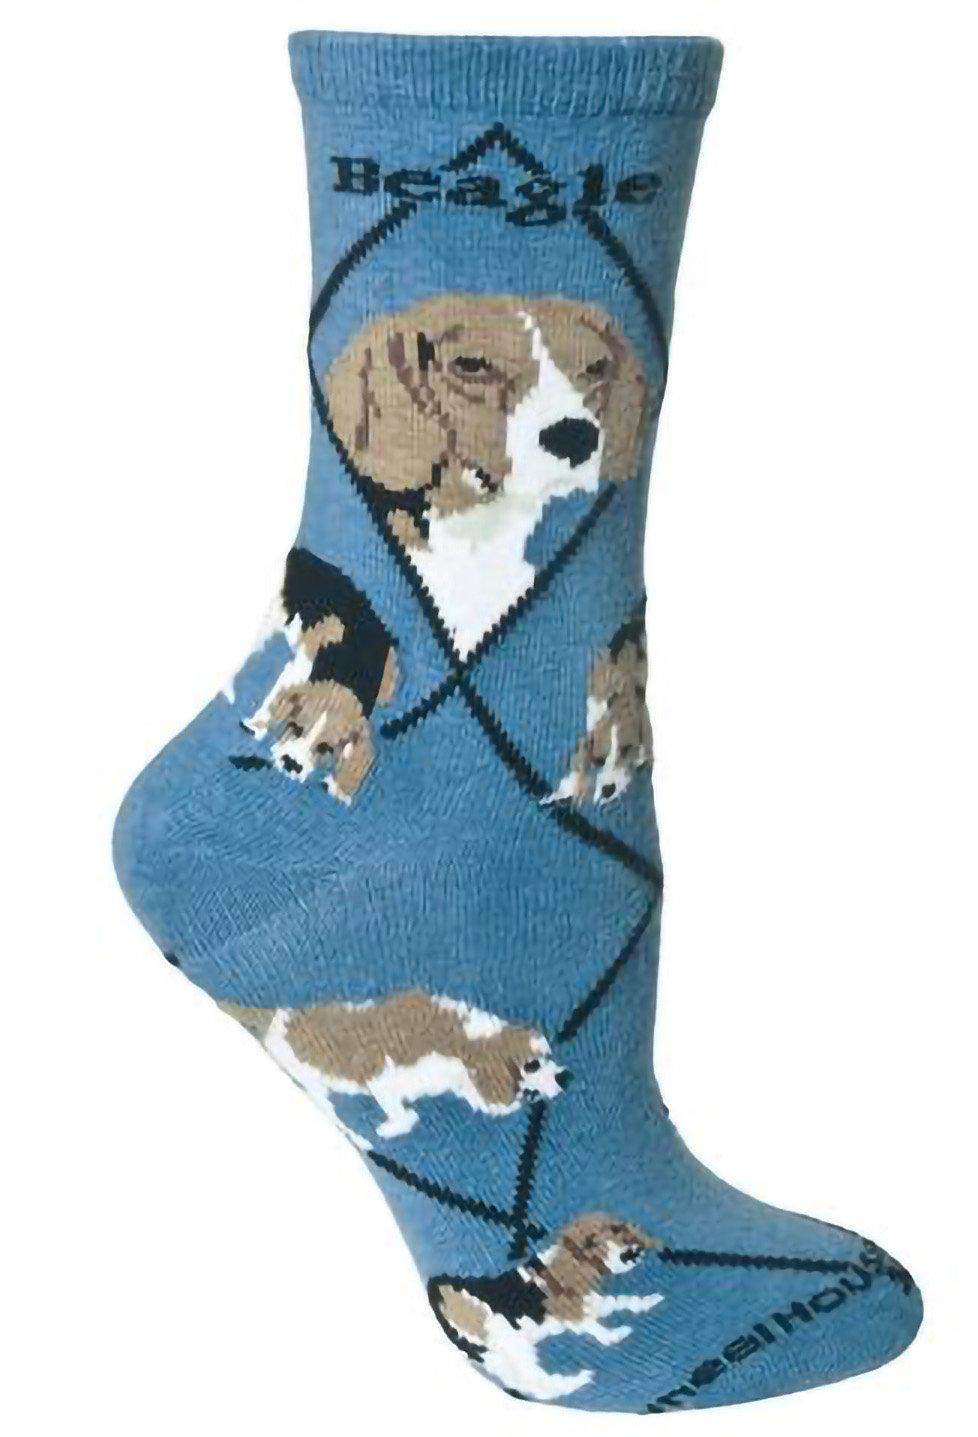 Wheelhouse Beagle on Blue Lightweight Stretch Cotton Crew Sock Adult Unisex Size 10-13